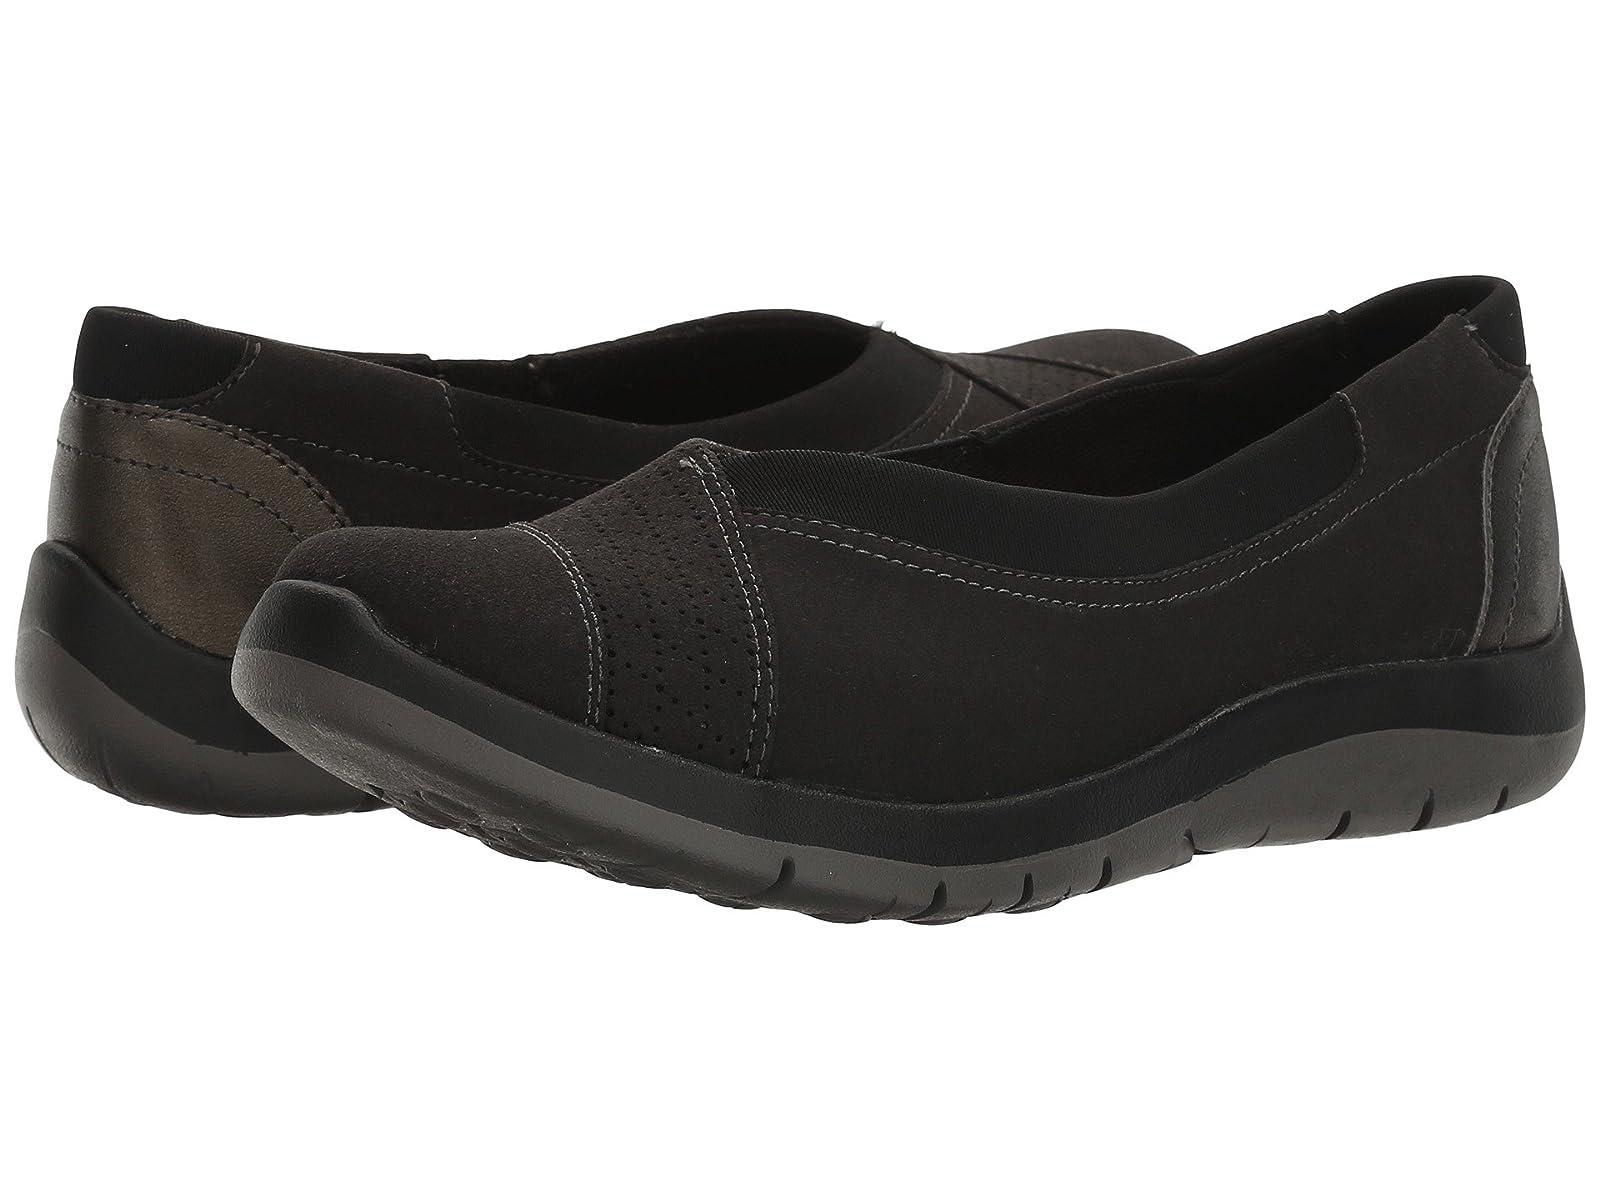 Aravon Wembly EnvelopeAtmospheric grades have affordable shoes